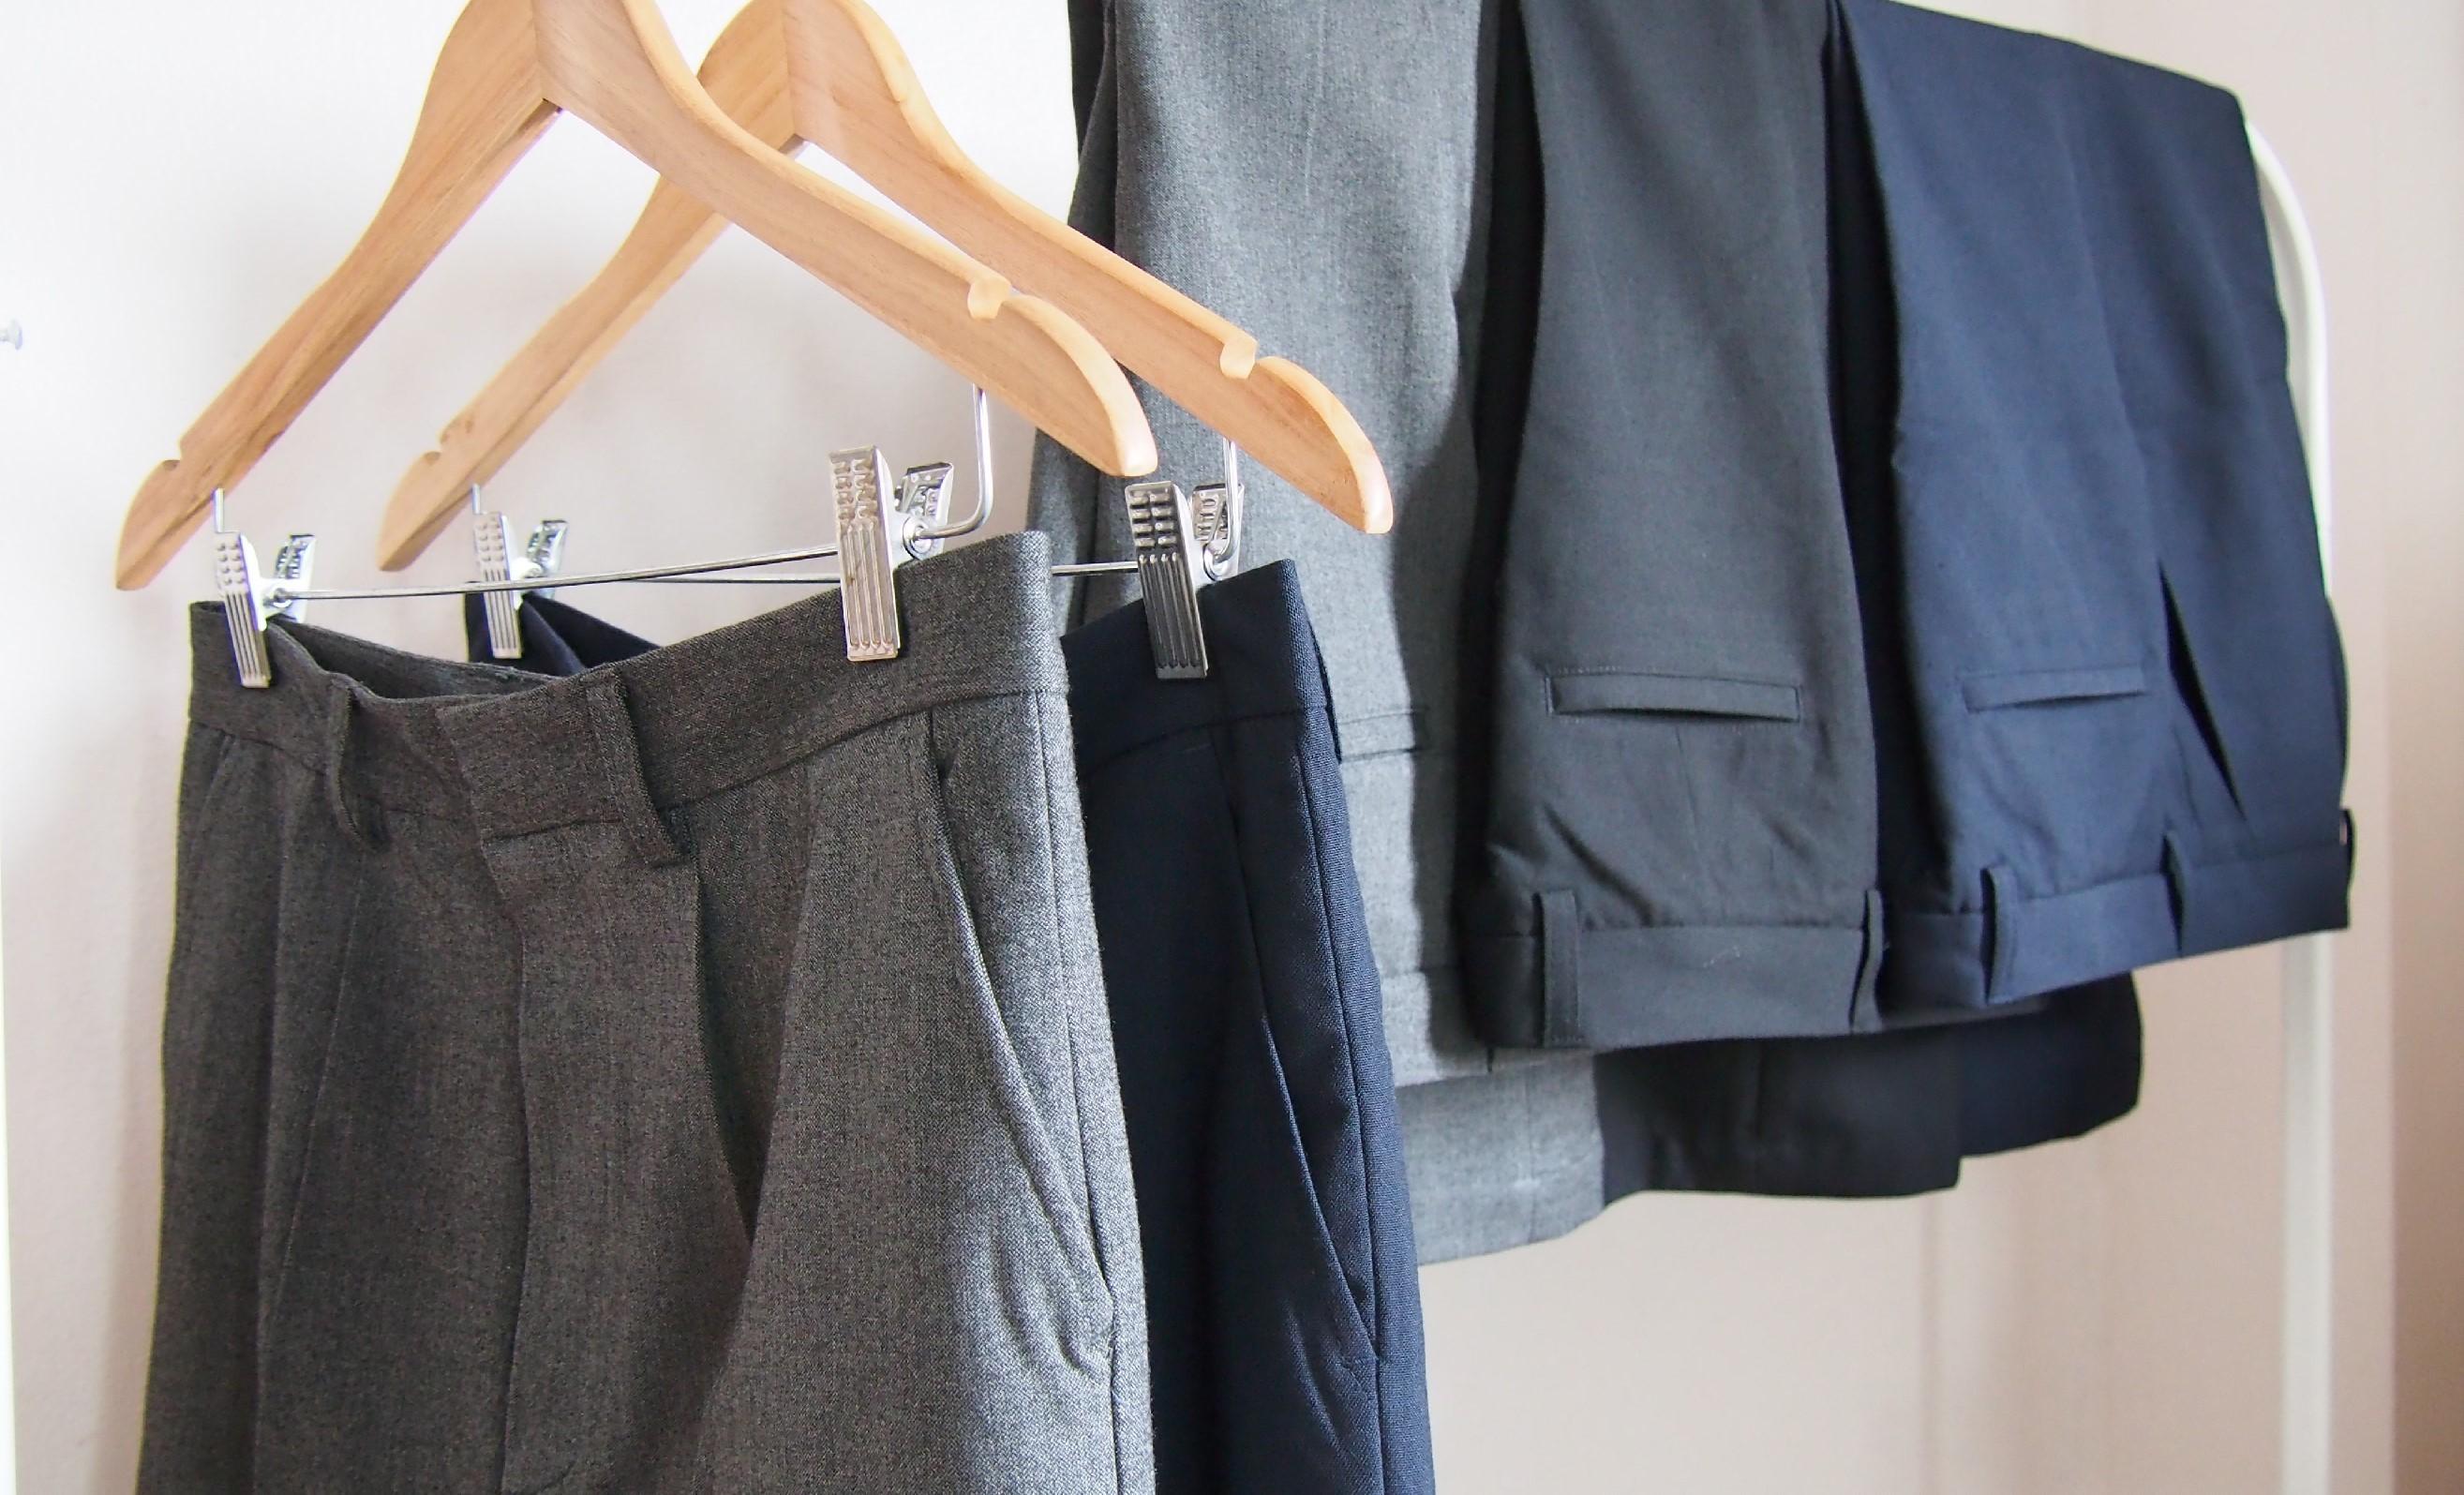 men,ผู้ชาย,กางเกง,กางเกงผู้ชาย,กางเกงขายาว,กางเกงขายาวผู้ชาย